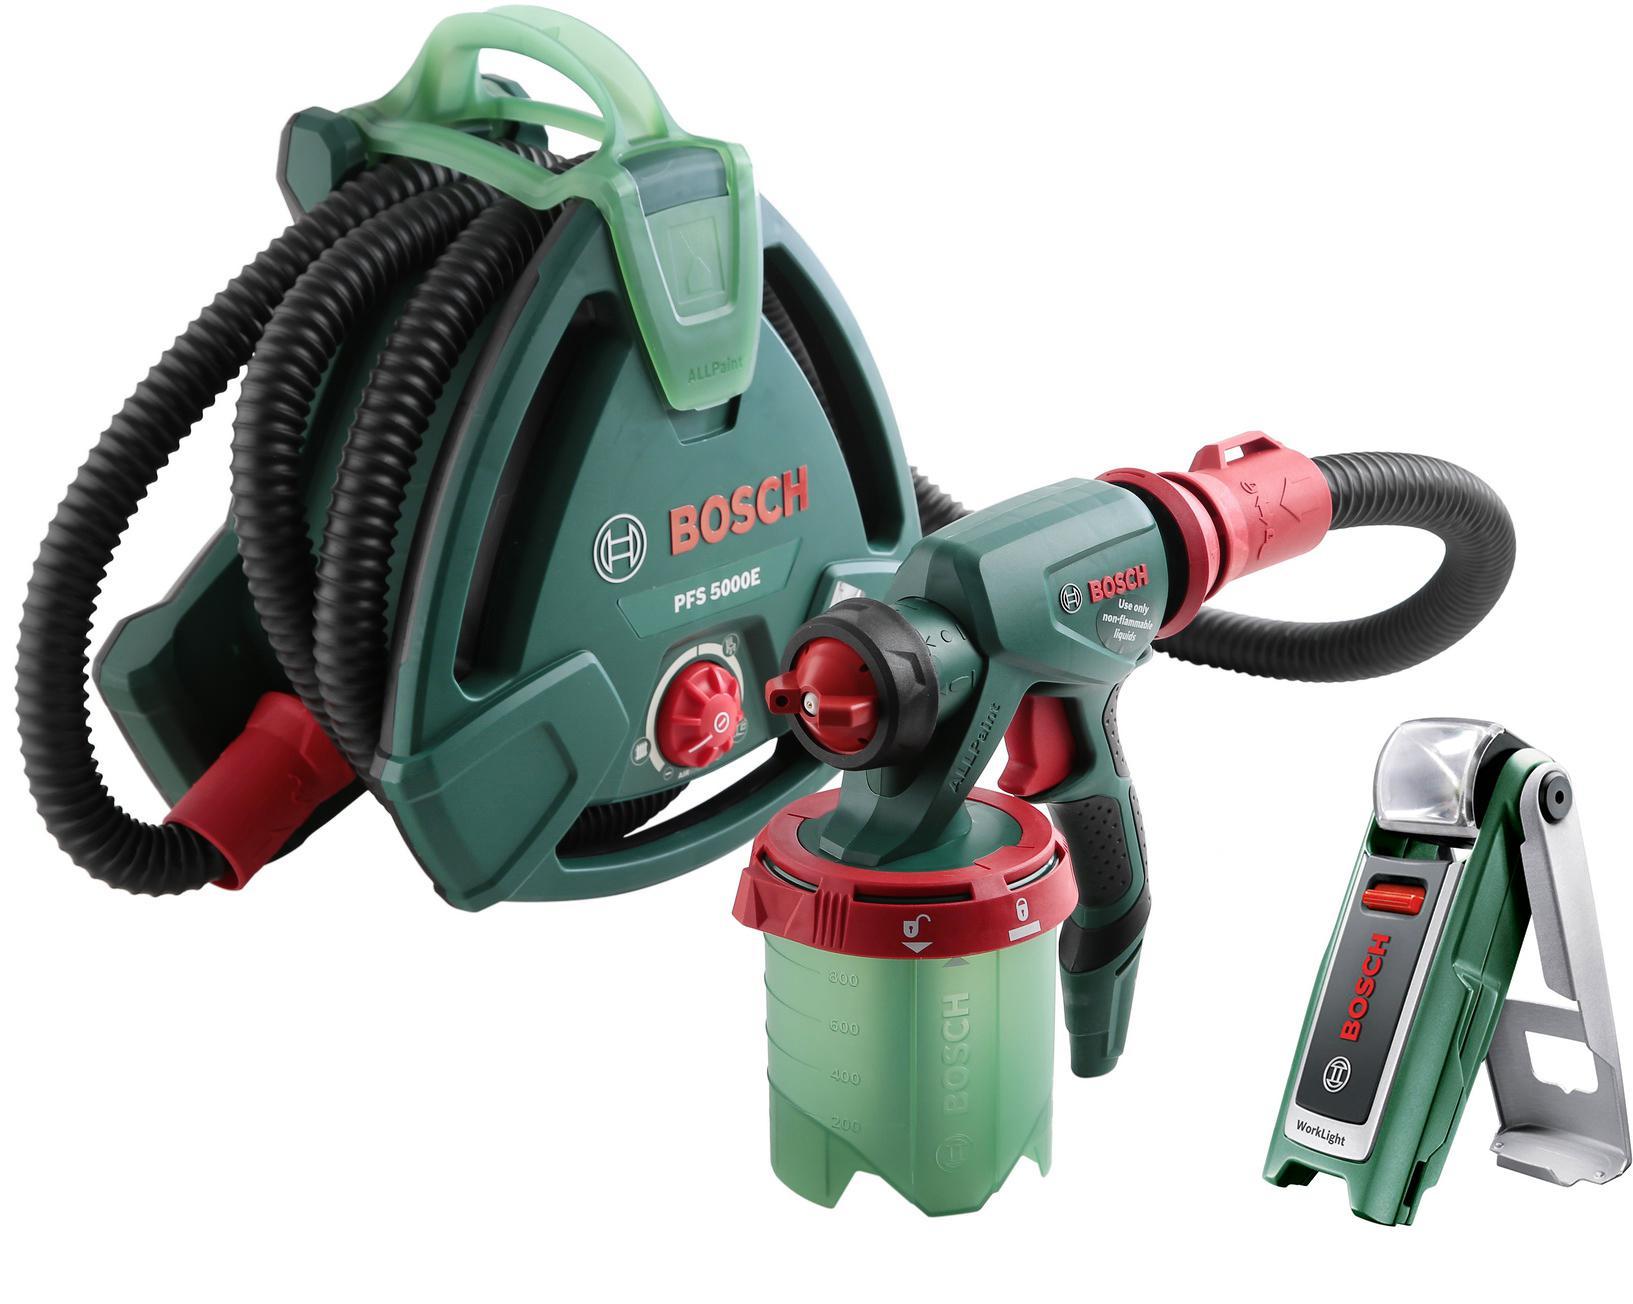 Набор Bosch Краскопульт pfs 5000 e (0.603.207.200) +Фонарь 0603975801